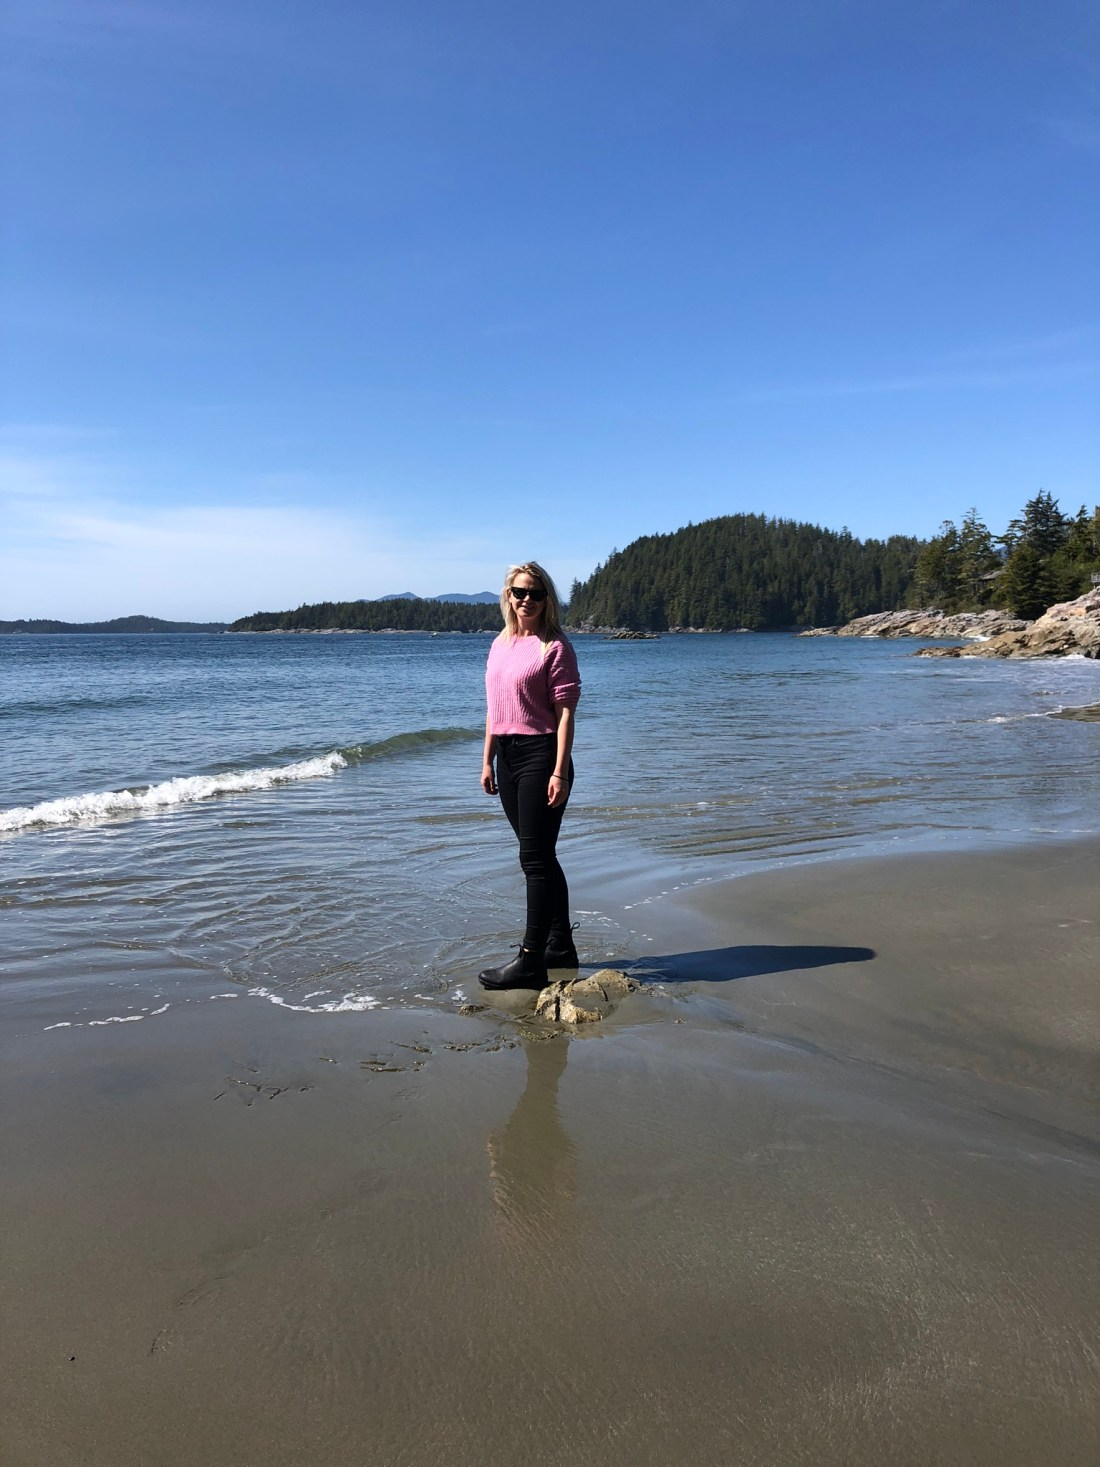 Laura on Tonquin Beach, Tofino